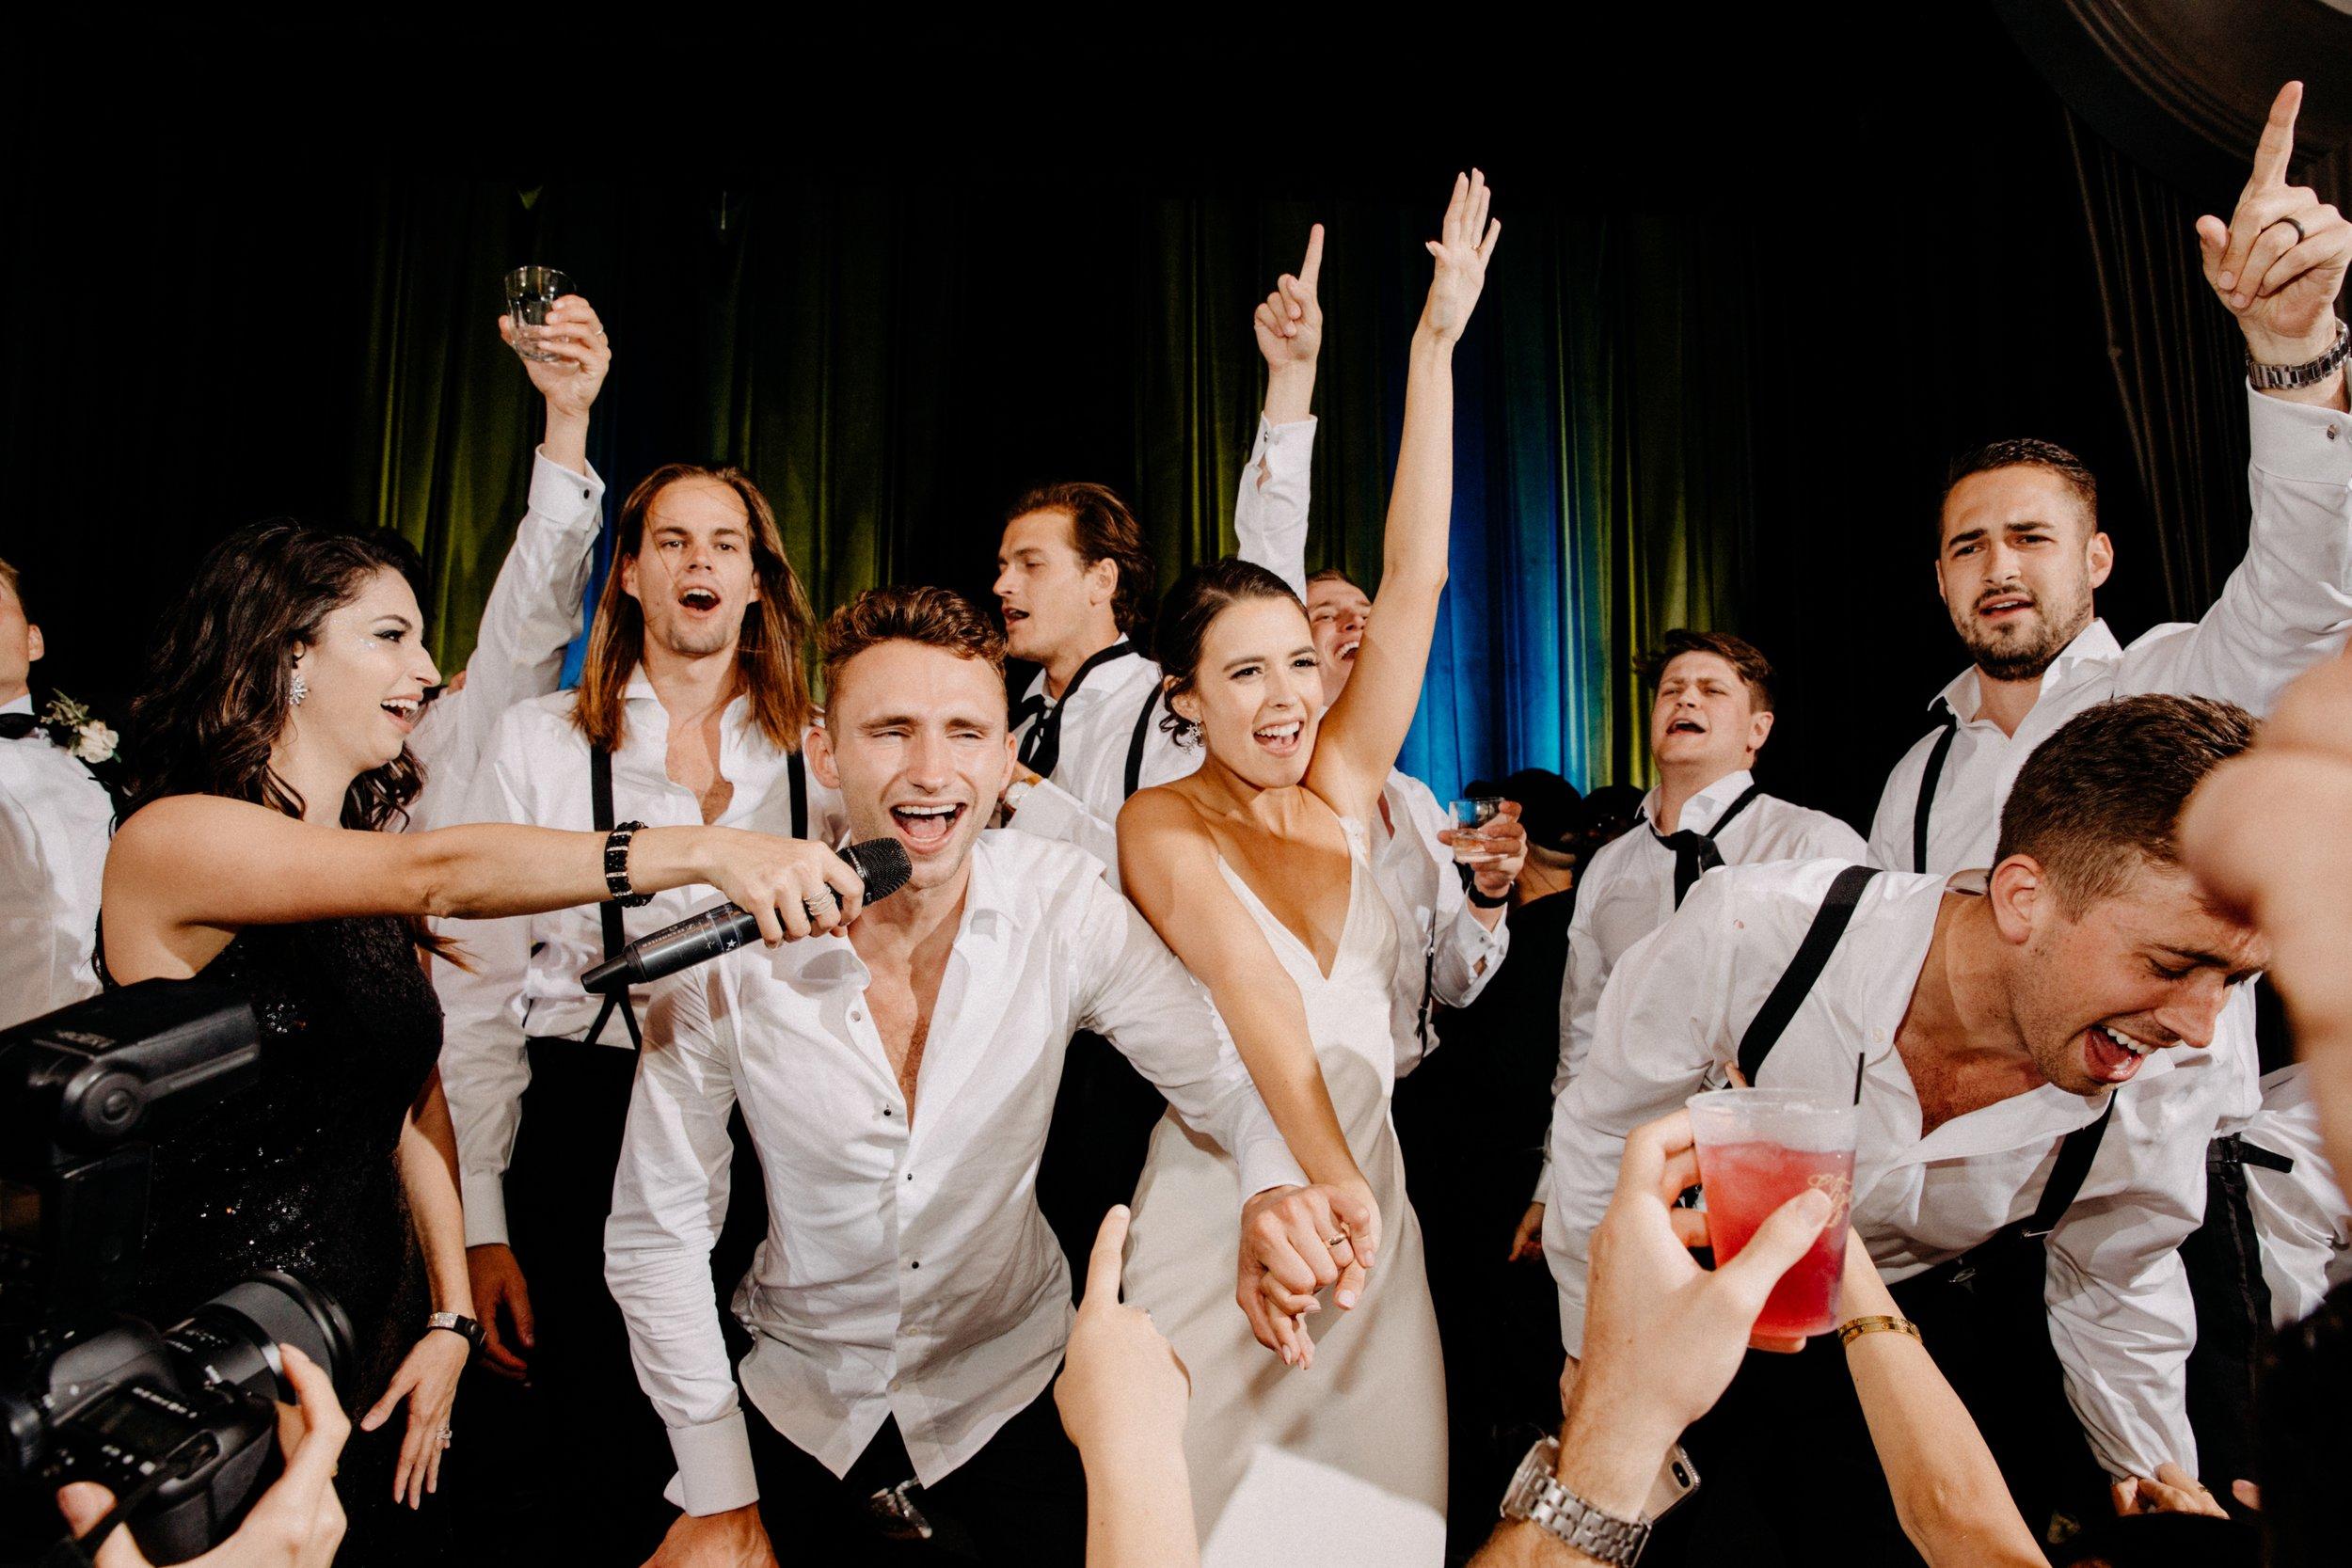 st-anthony-hotel-wedding-photography-10208san-antonio.JPG